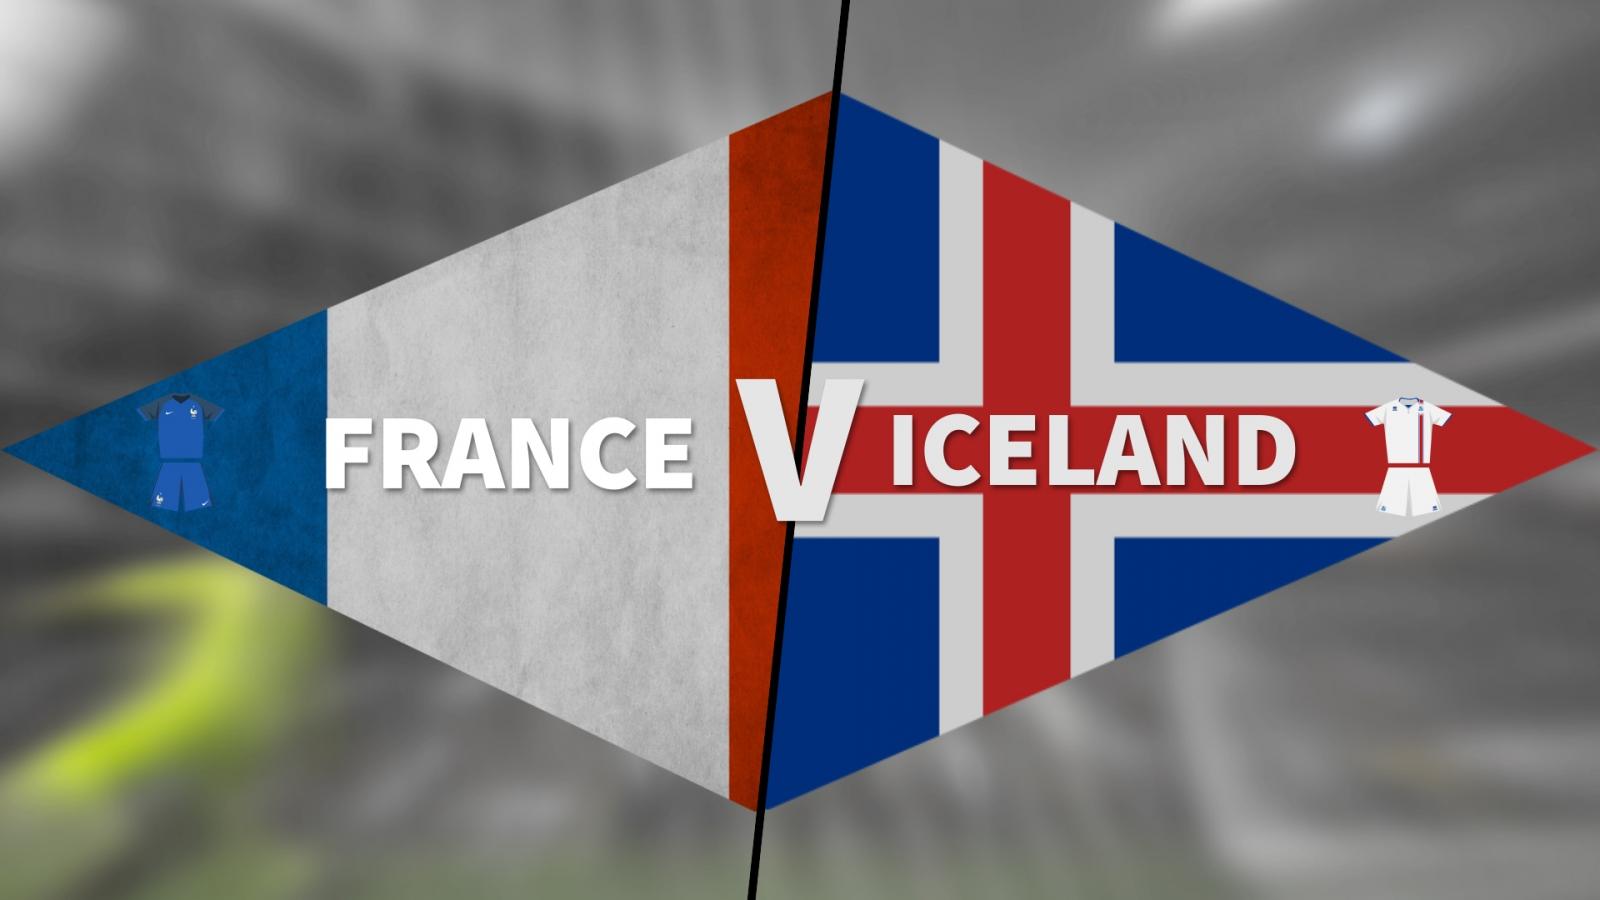 france vs iceland - photo #1